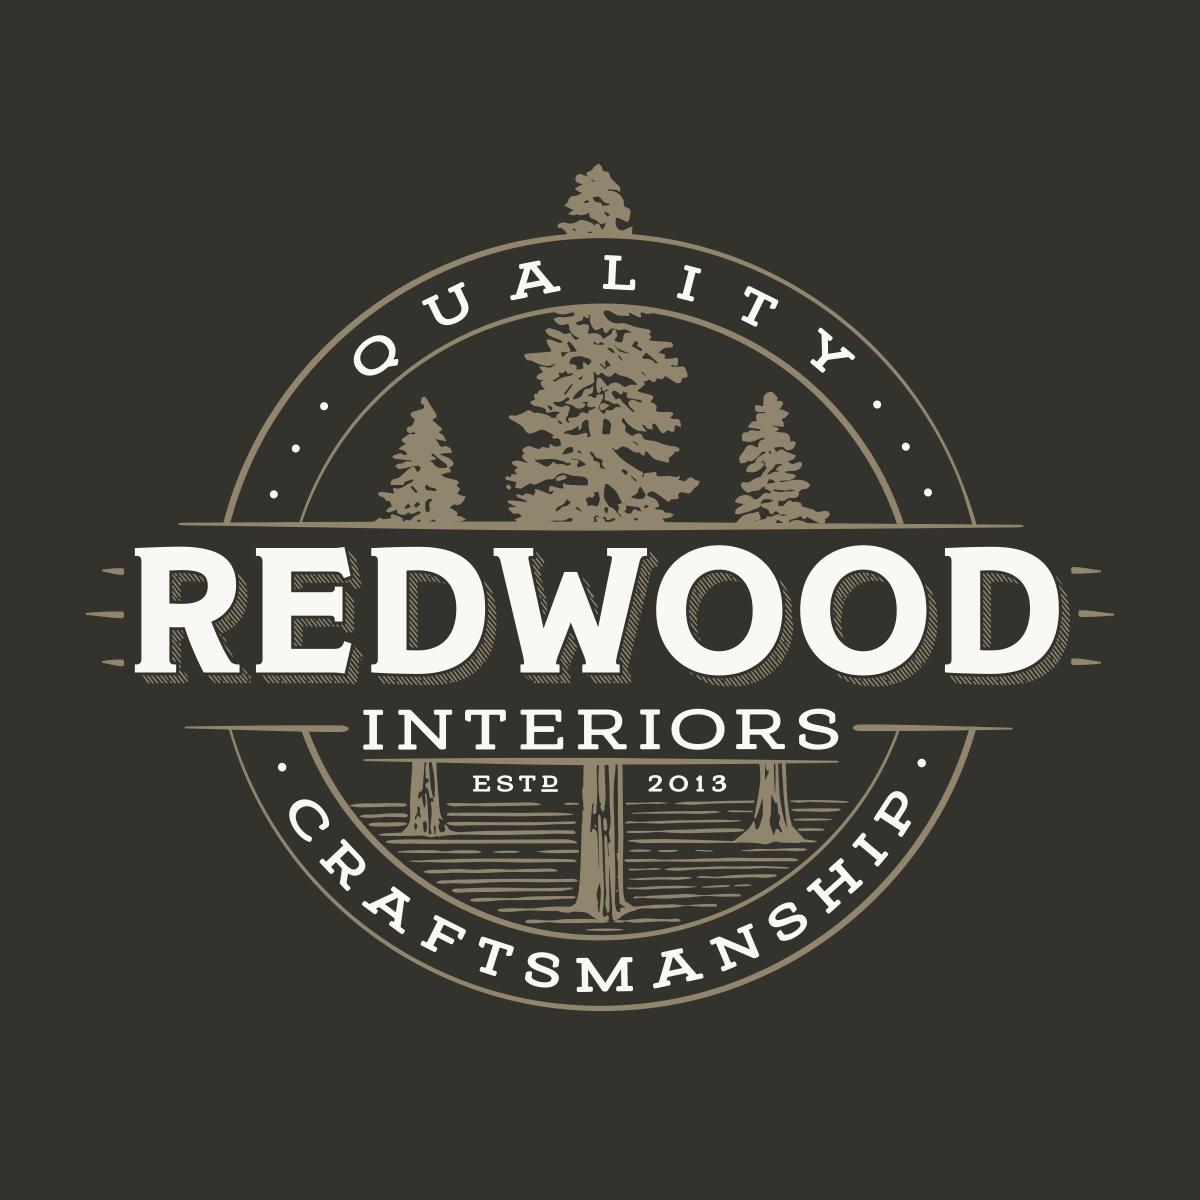 Redwood interiors logo and business card design